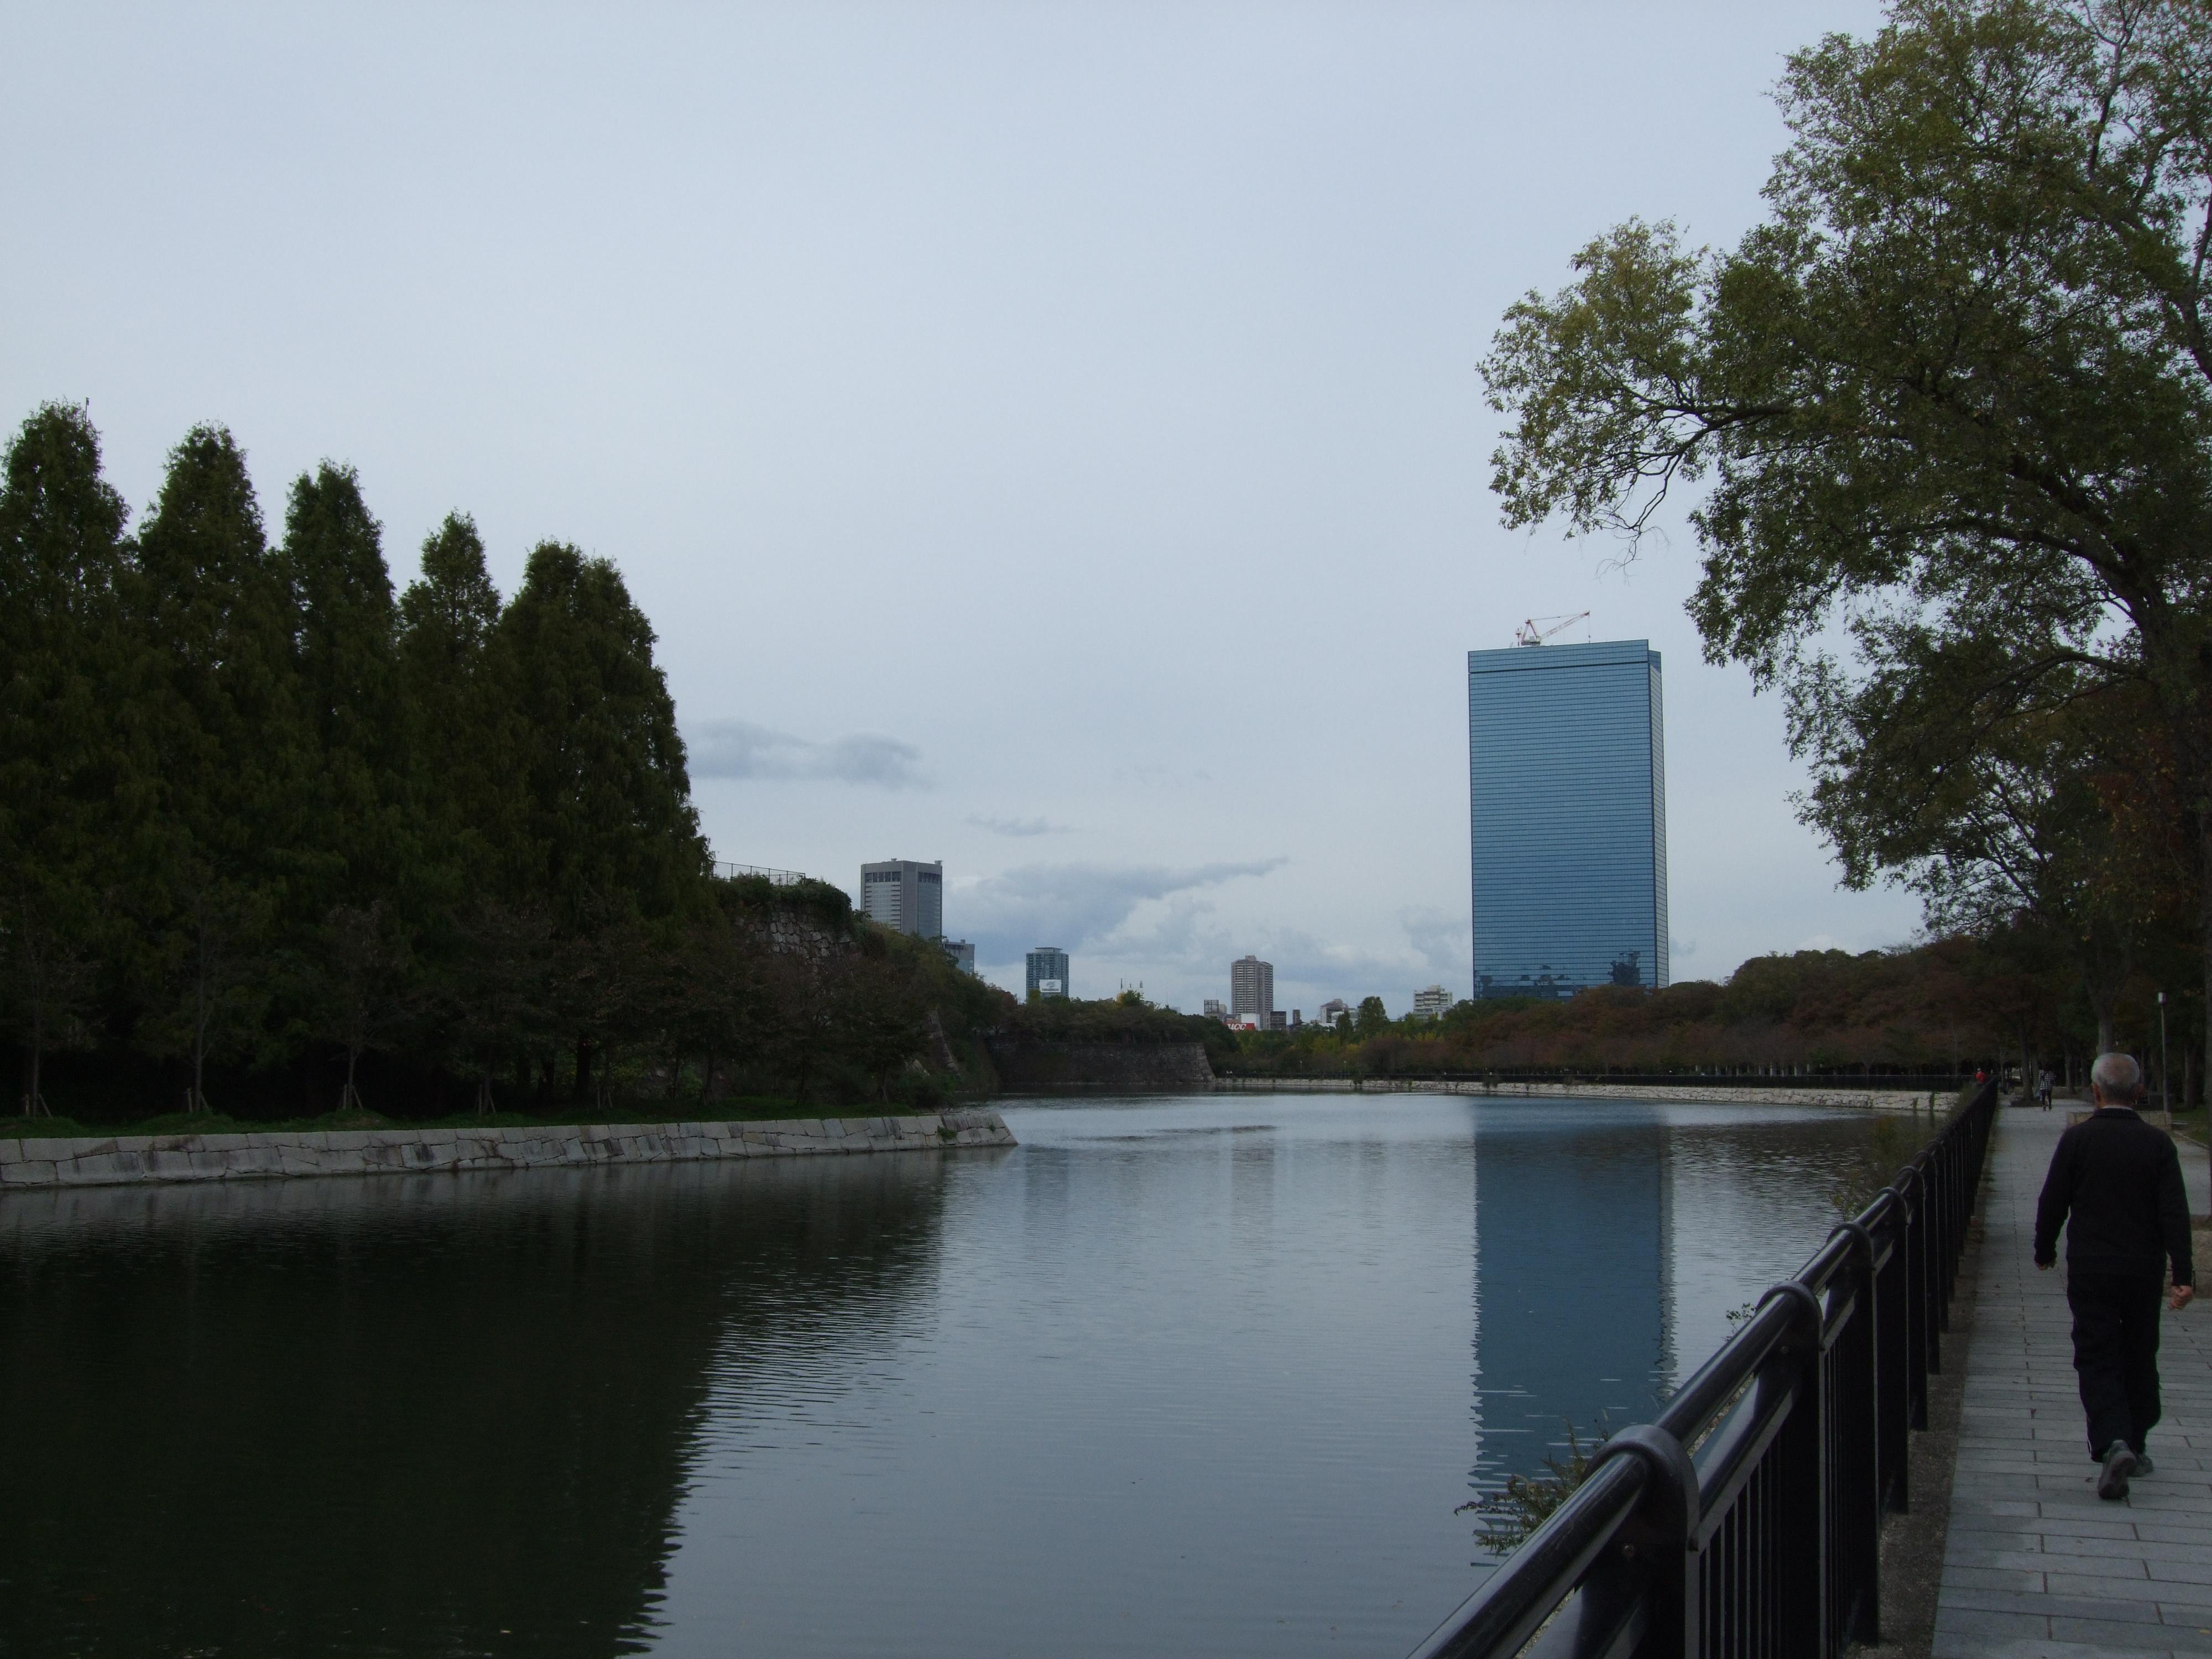 Osakajou kouen - Osakan linnan puisto I